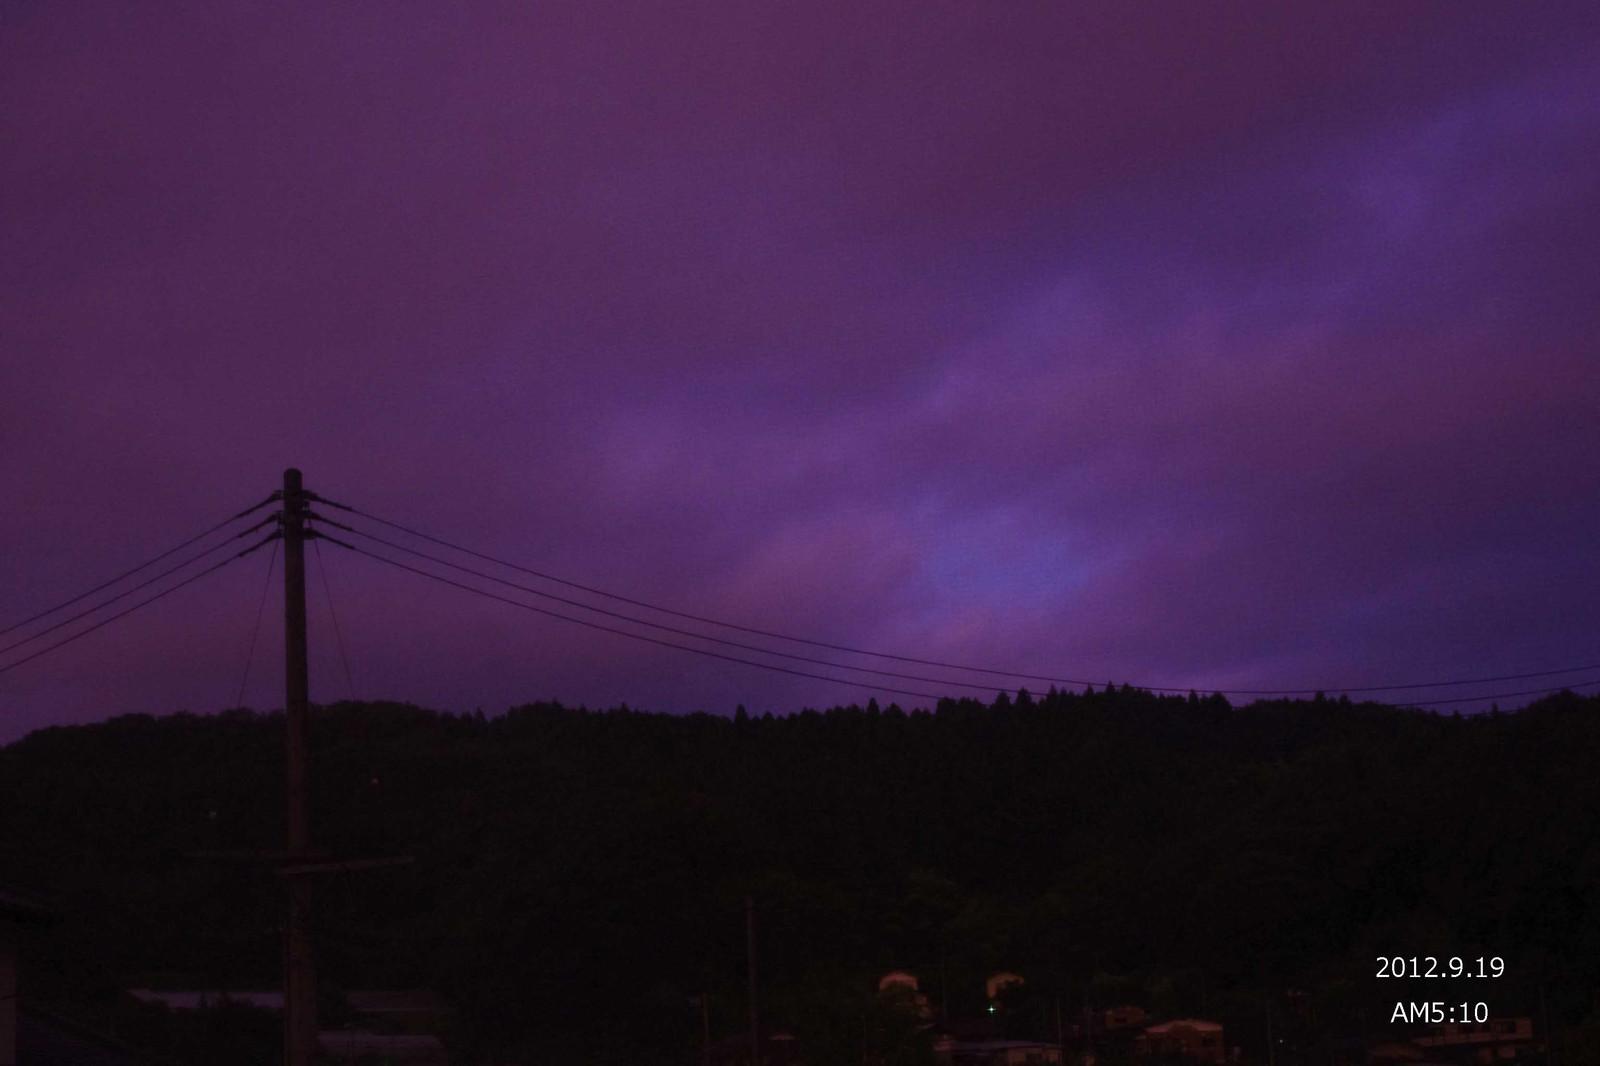 2012_09_19_9331_edited1